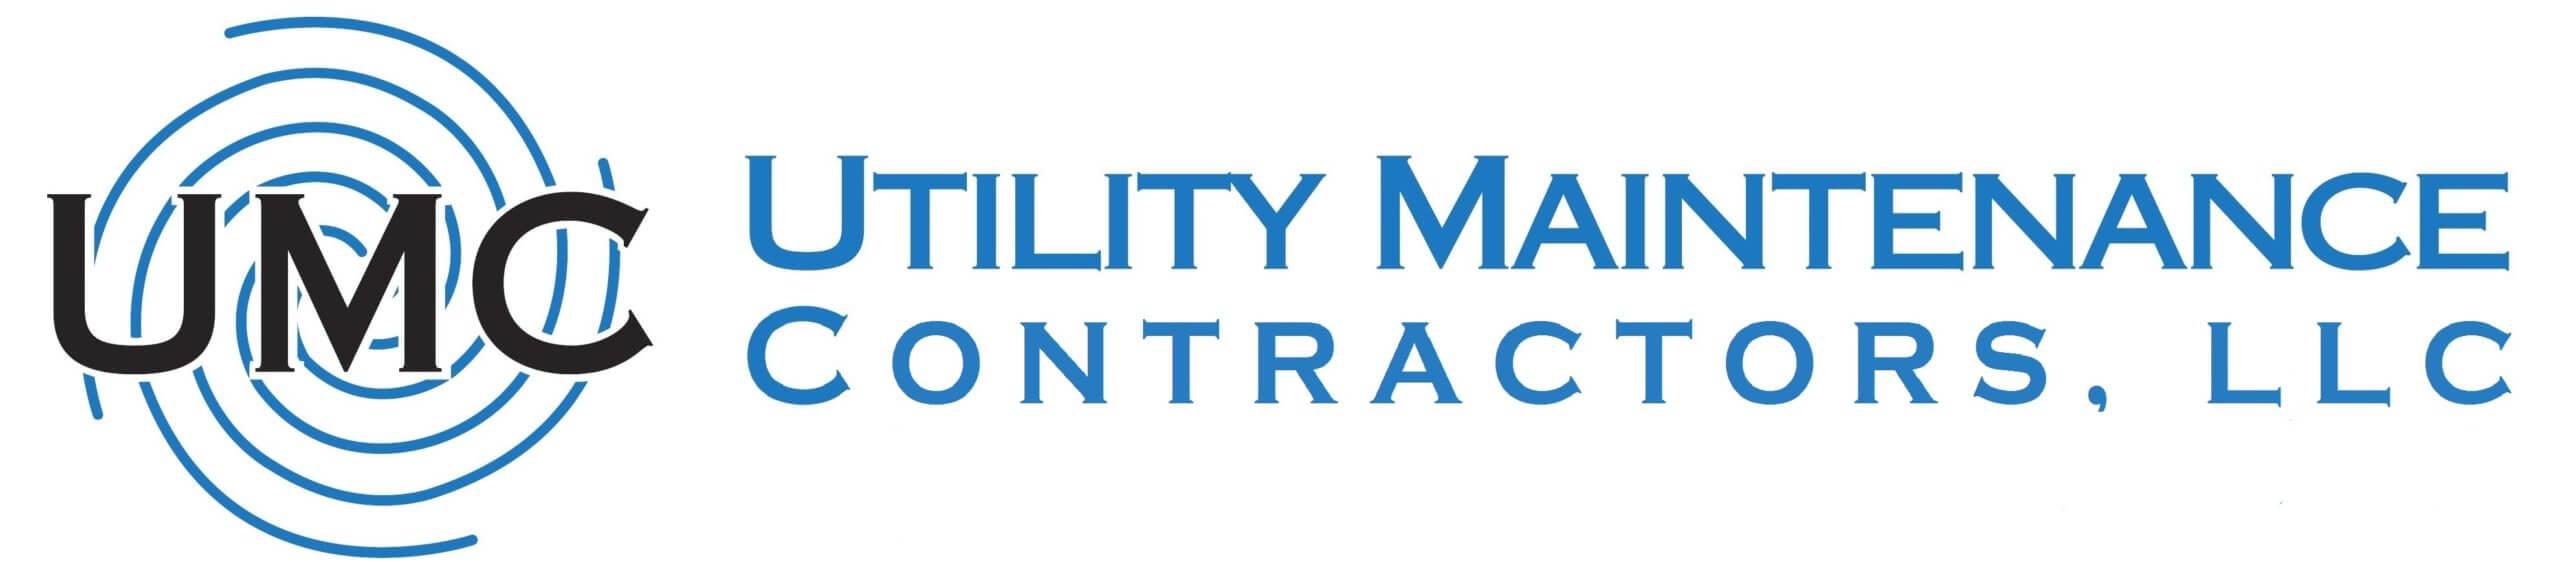 Utility Maintenance Contractors, LLC